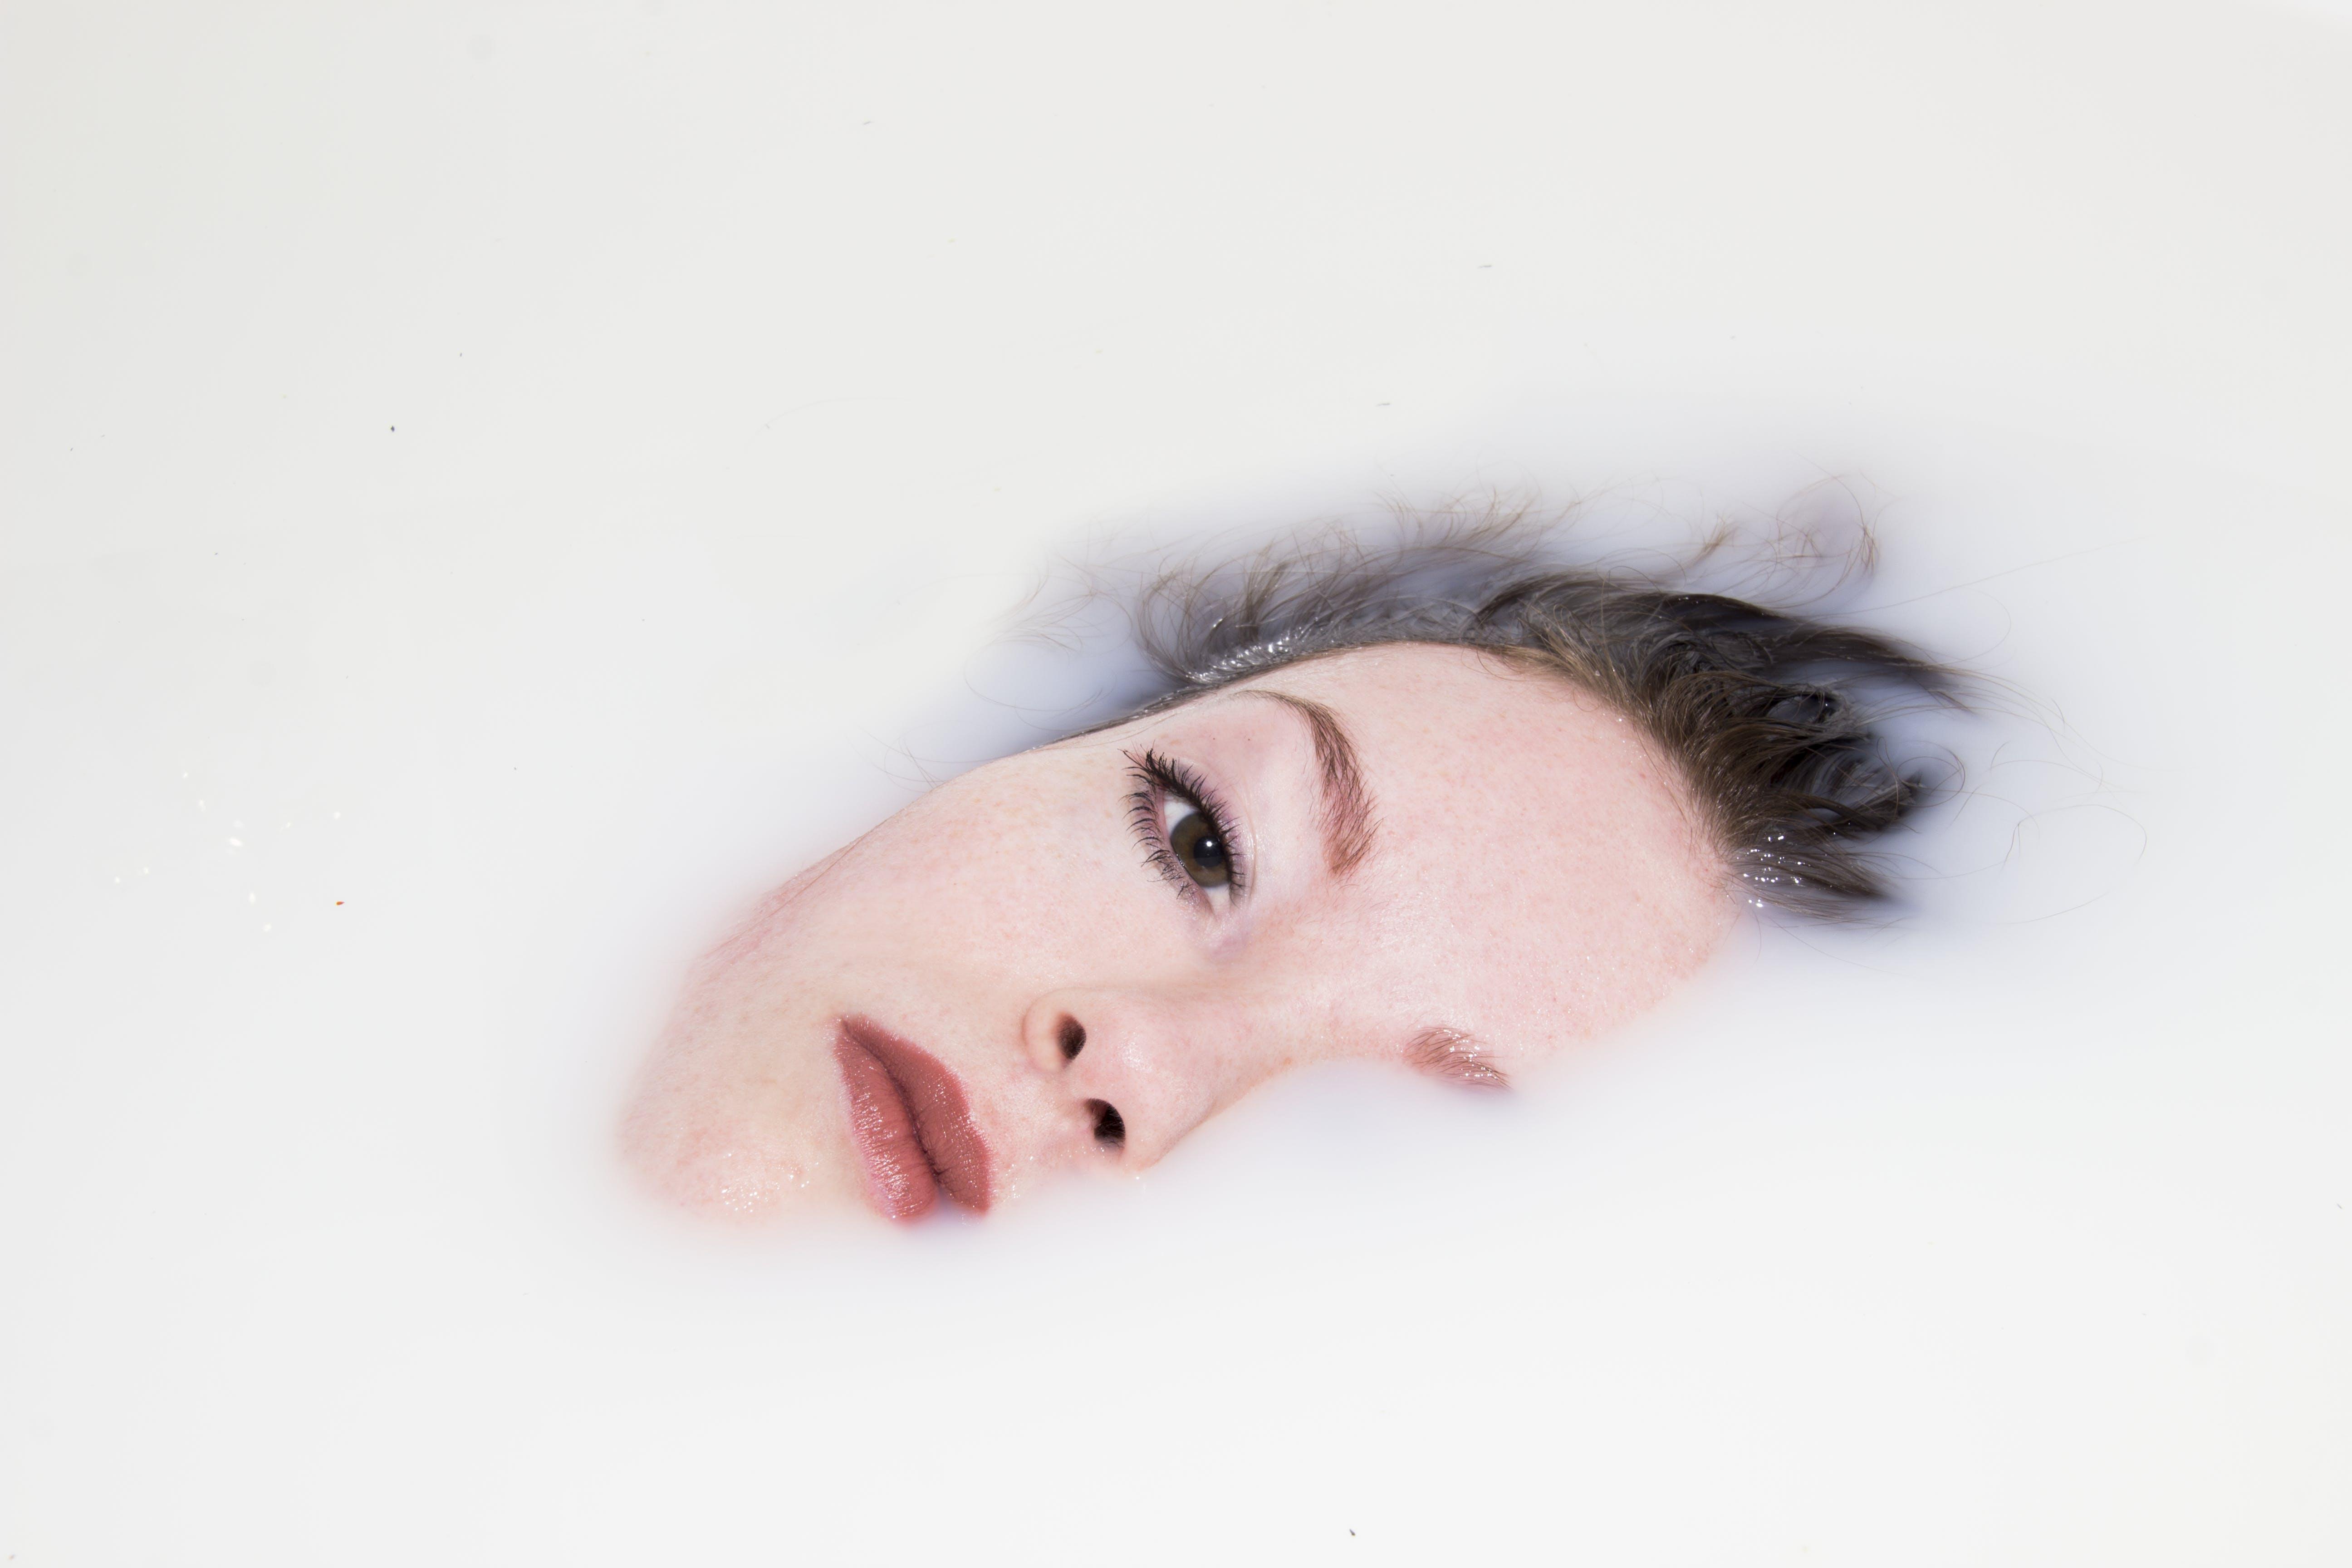 Woman's Face on White Liquid